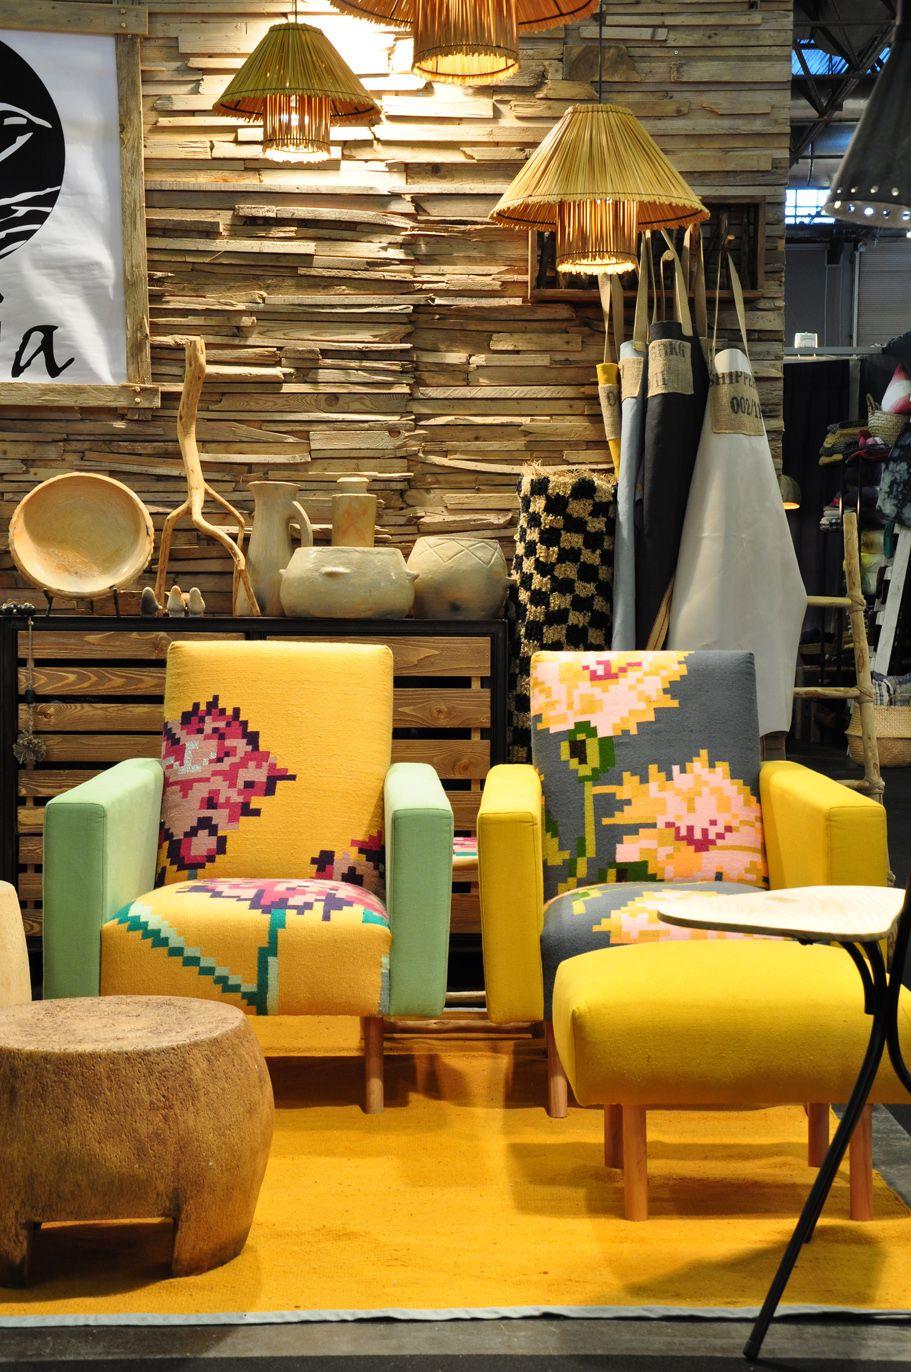 tinja maison et objet paris tinja handcrafted made in tunsia. Black Bedroom Furniture Sets. Home Design Ideas